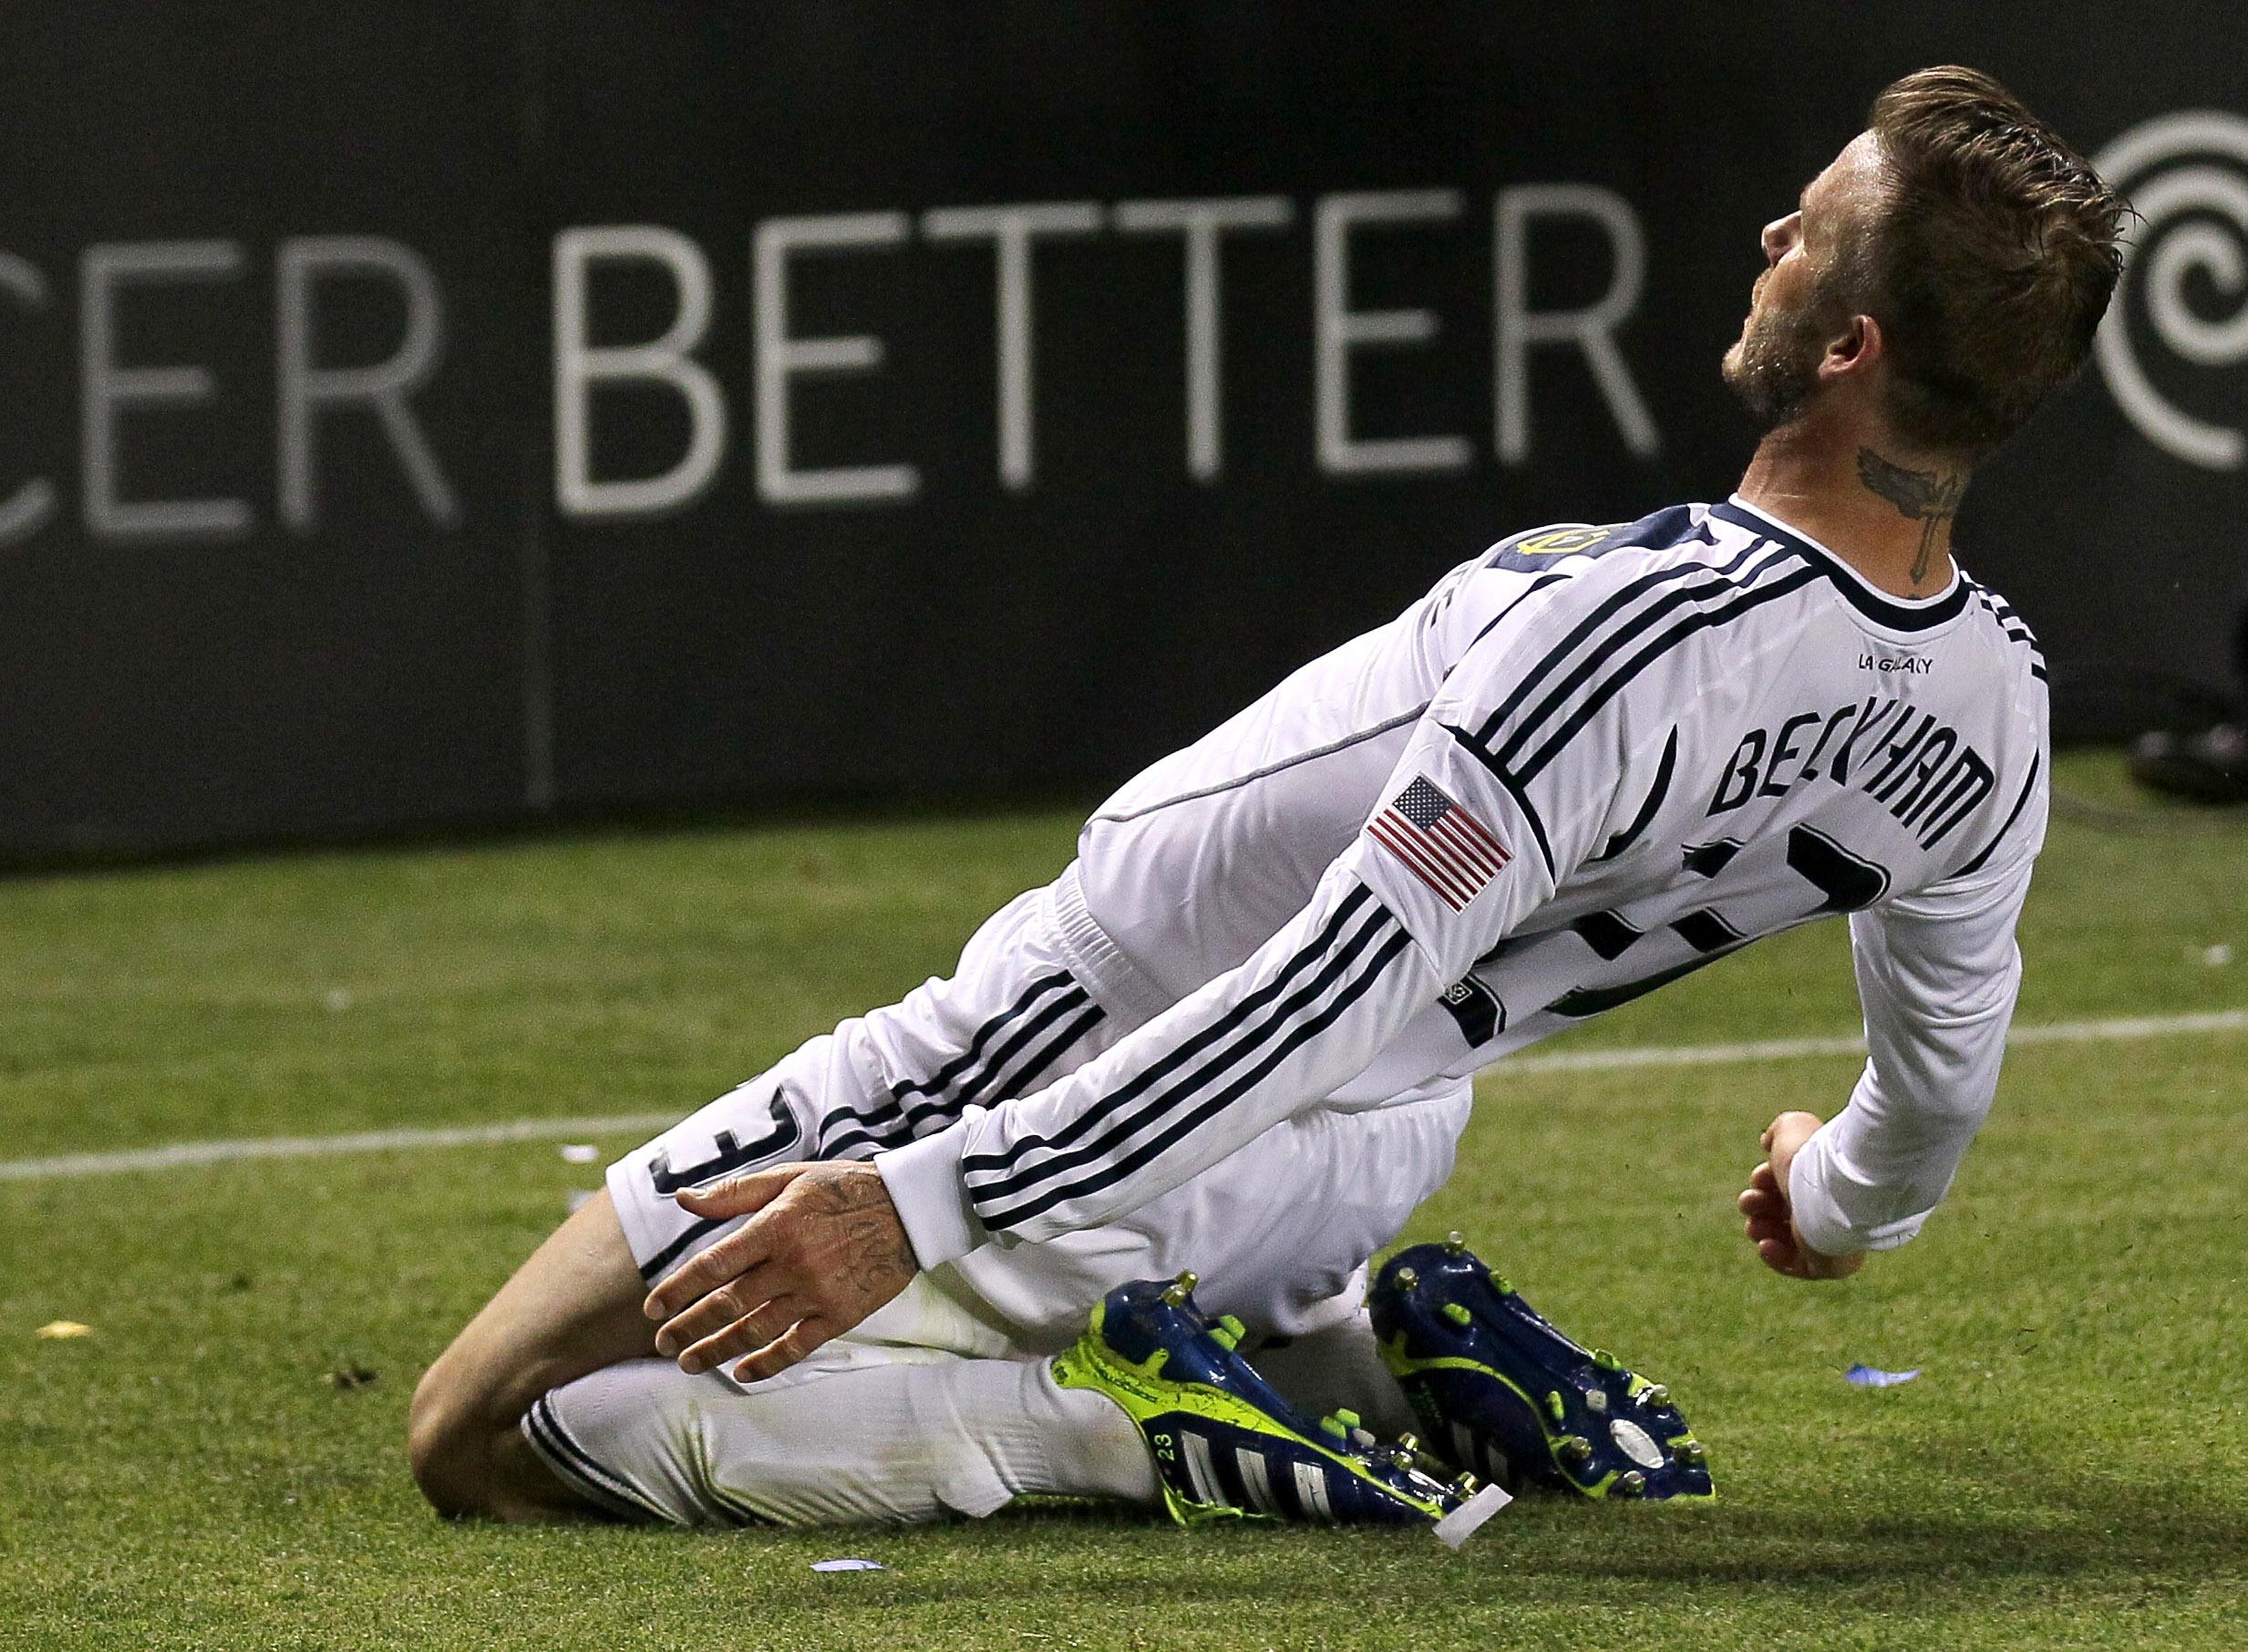 David Beckham Goal Celebration Slide Original